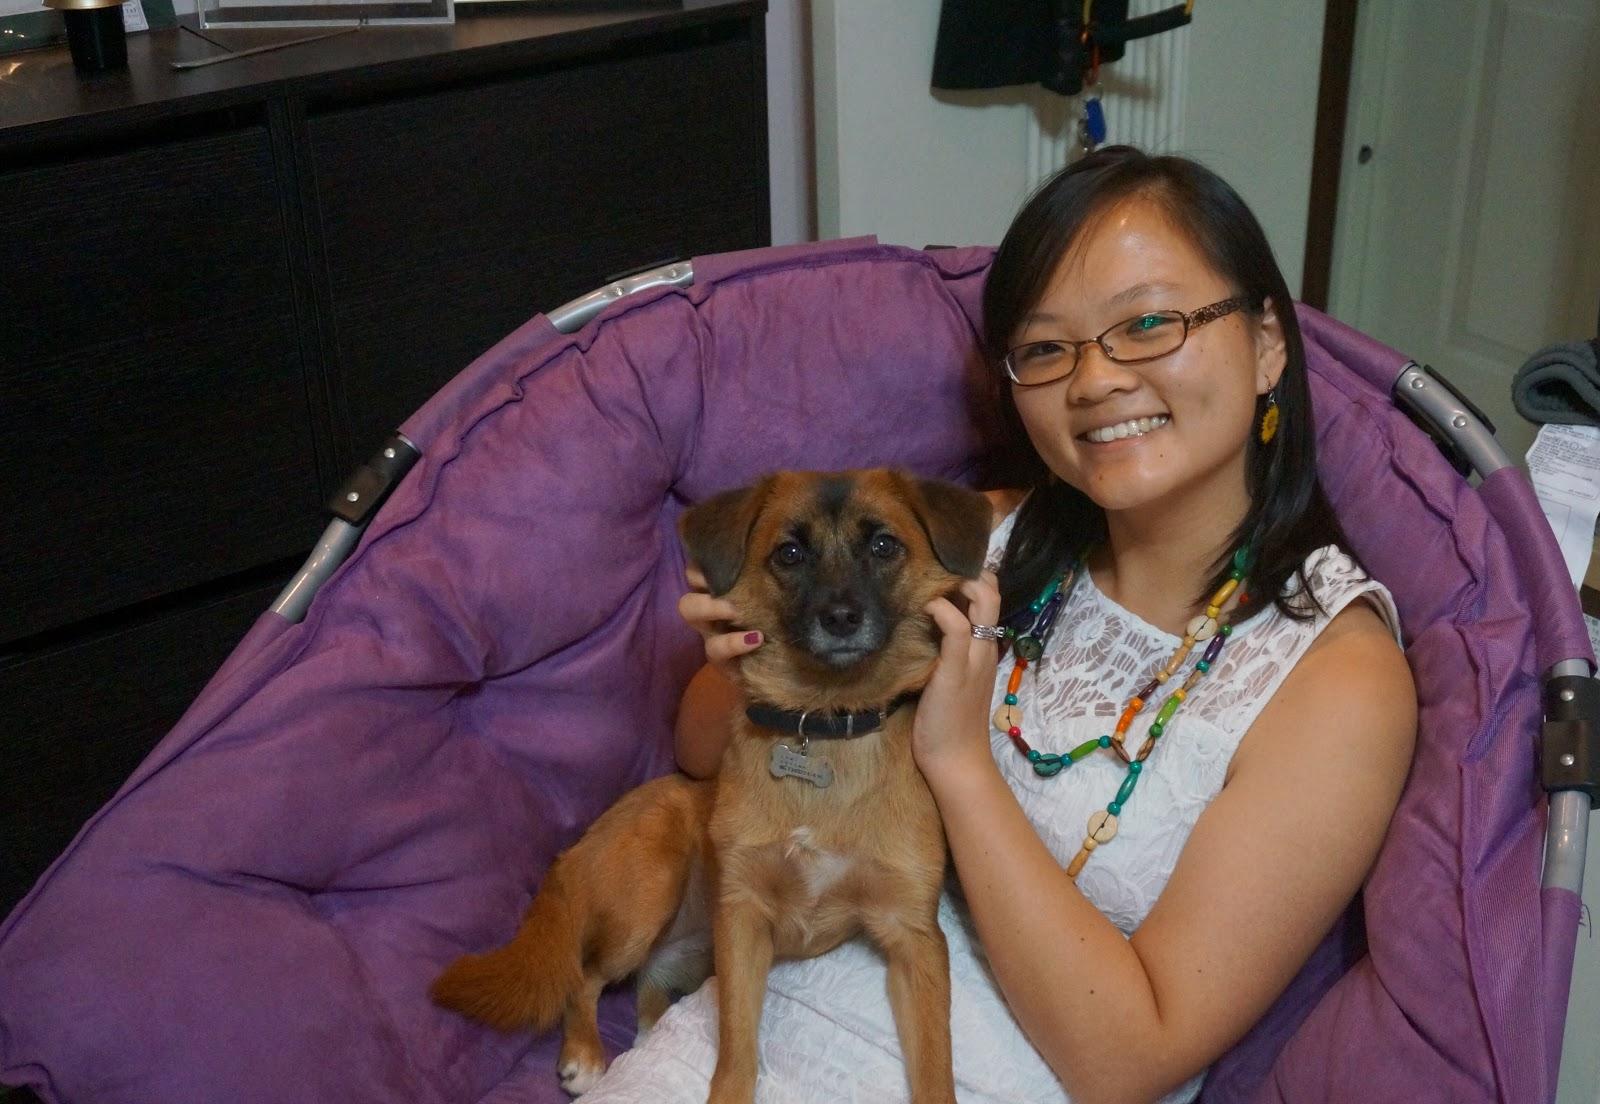 Ophelia and her bilingual dog, Coco